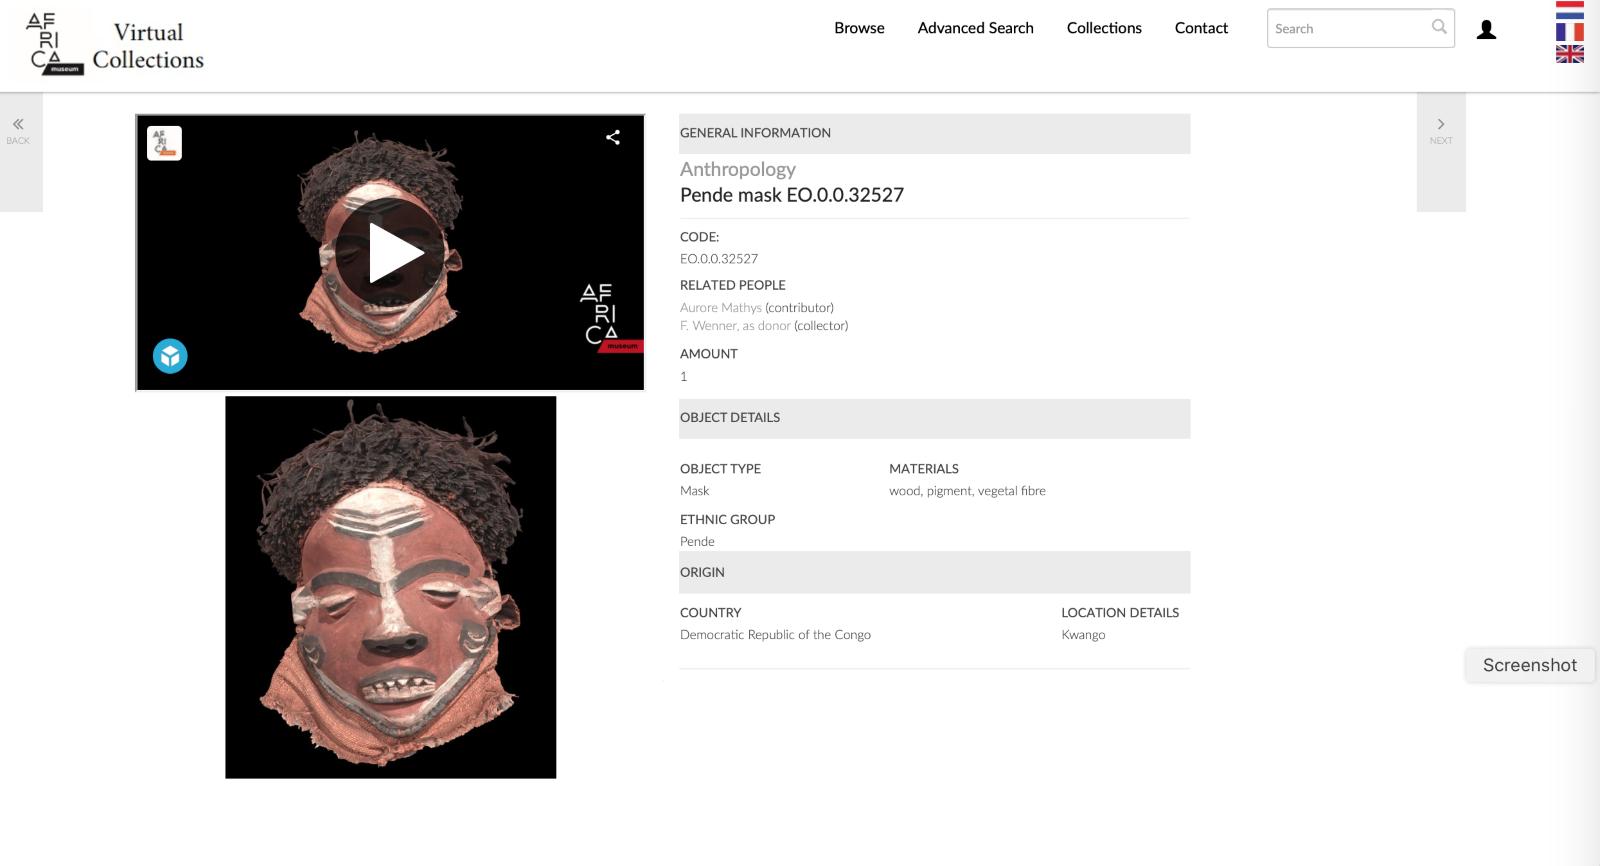 africamuseum virtual collections platform screenshot